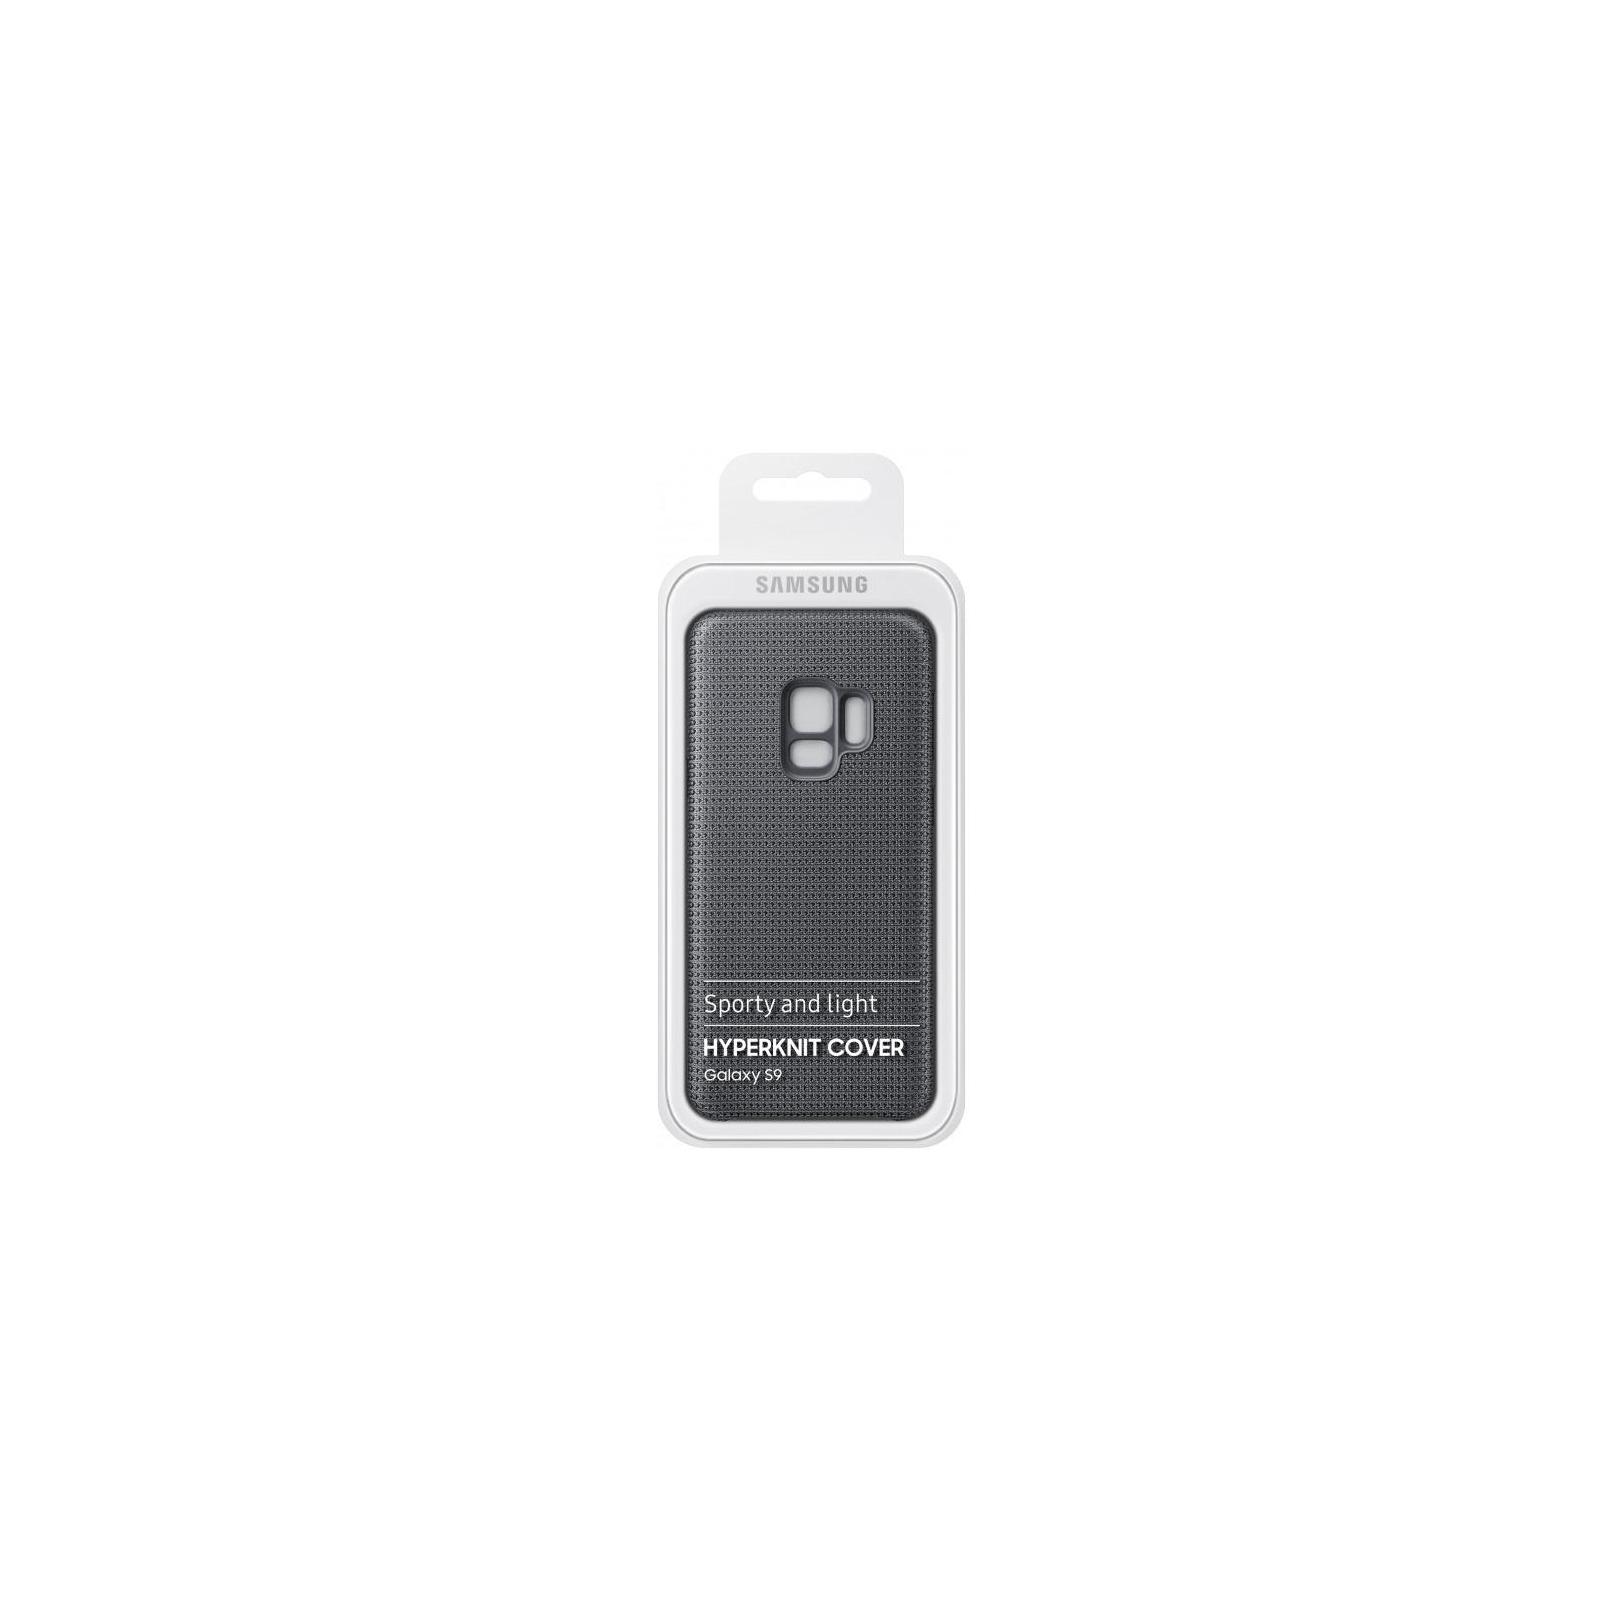 Чехол для моб. телефона Samsung для Galaxy S9 (G960) Hyperknit Cover Grey (EF-GG960FJEGRU) изображение 6